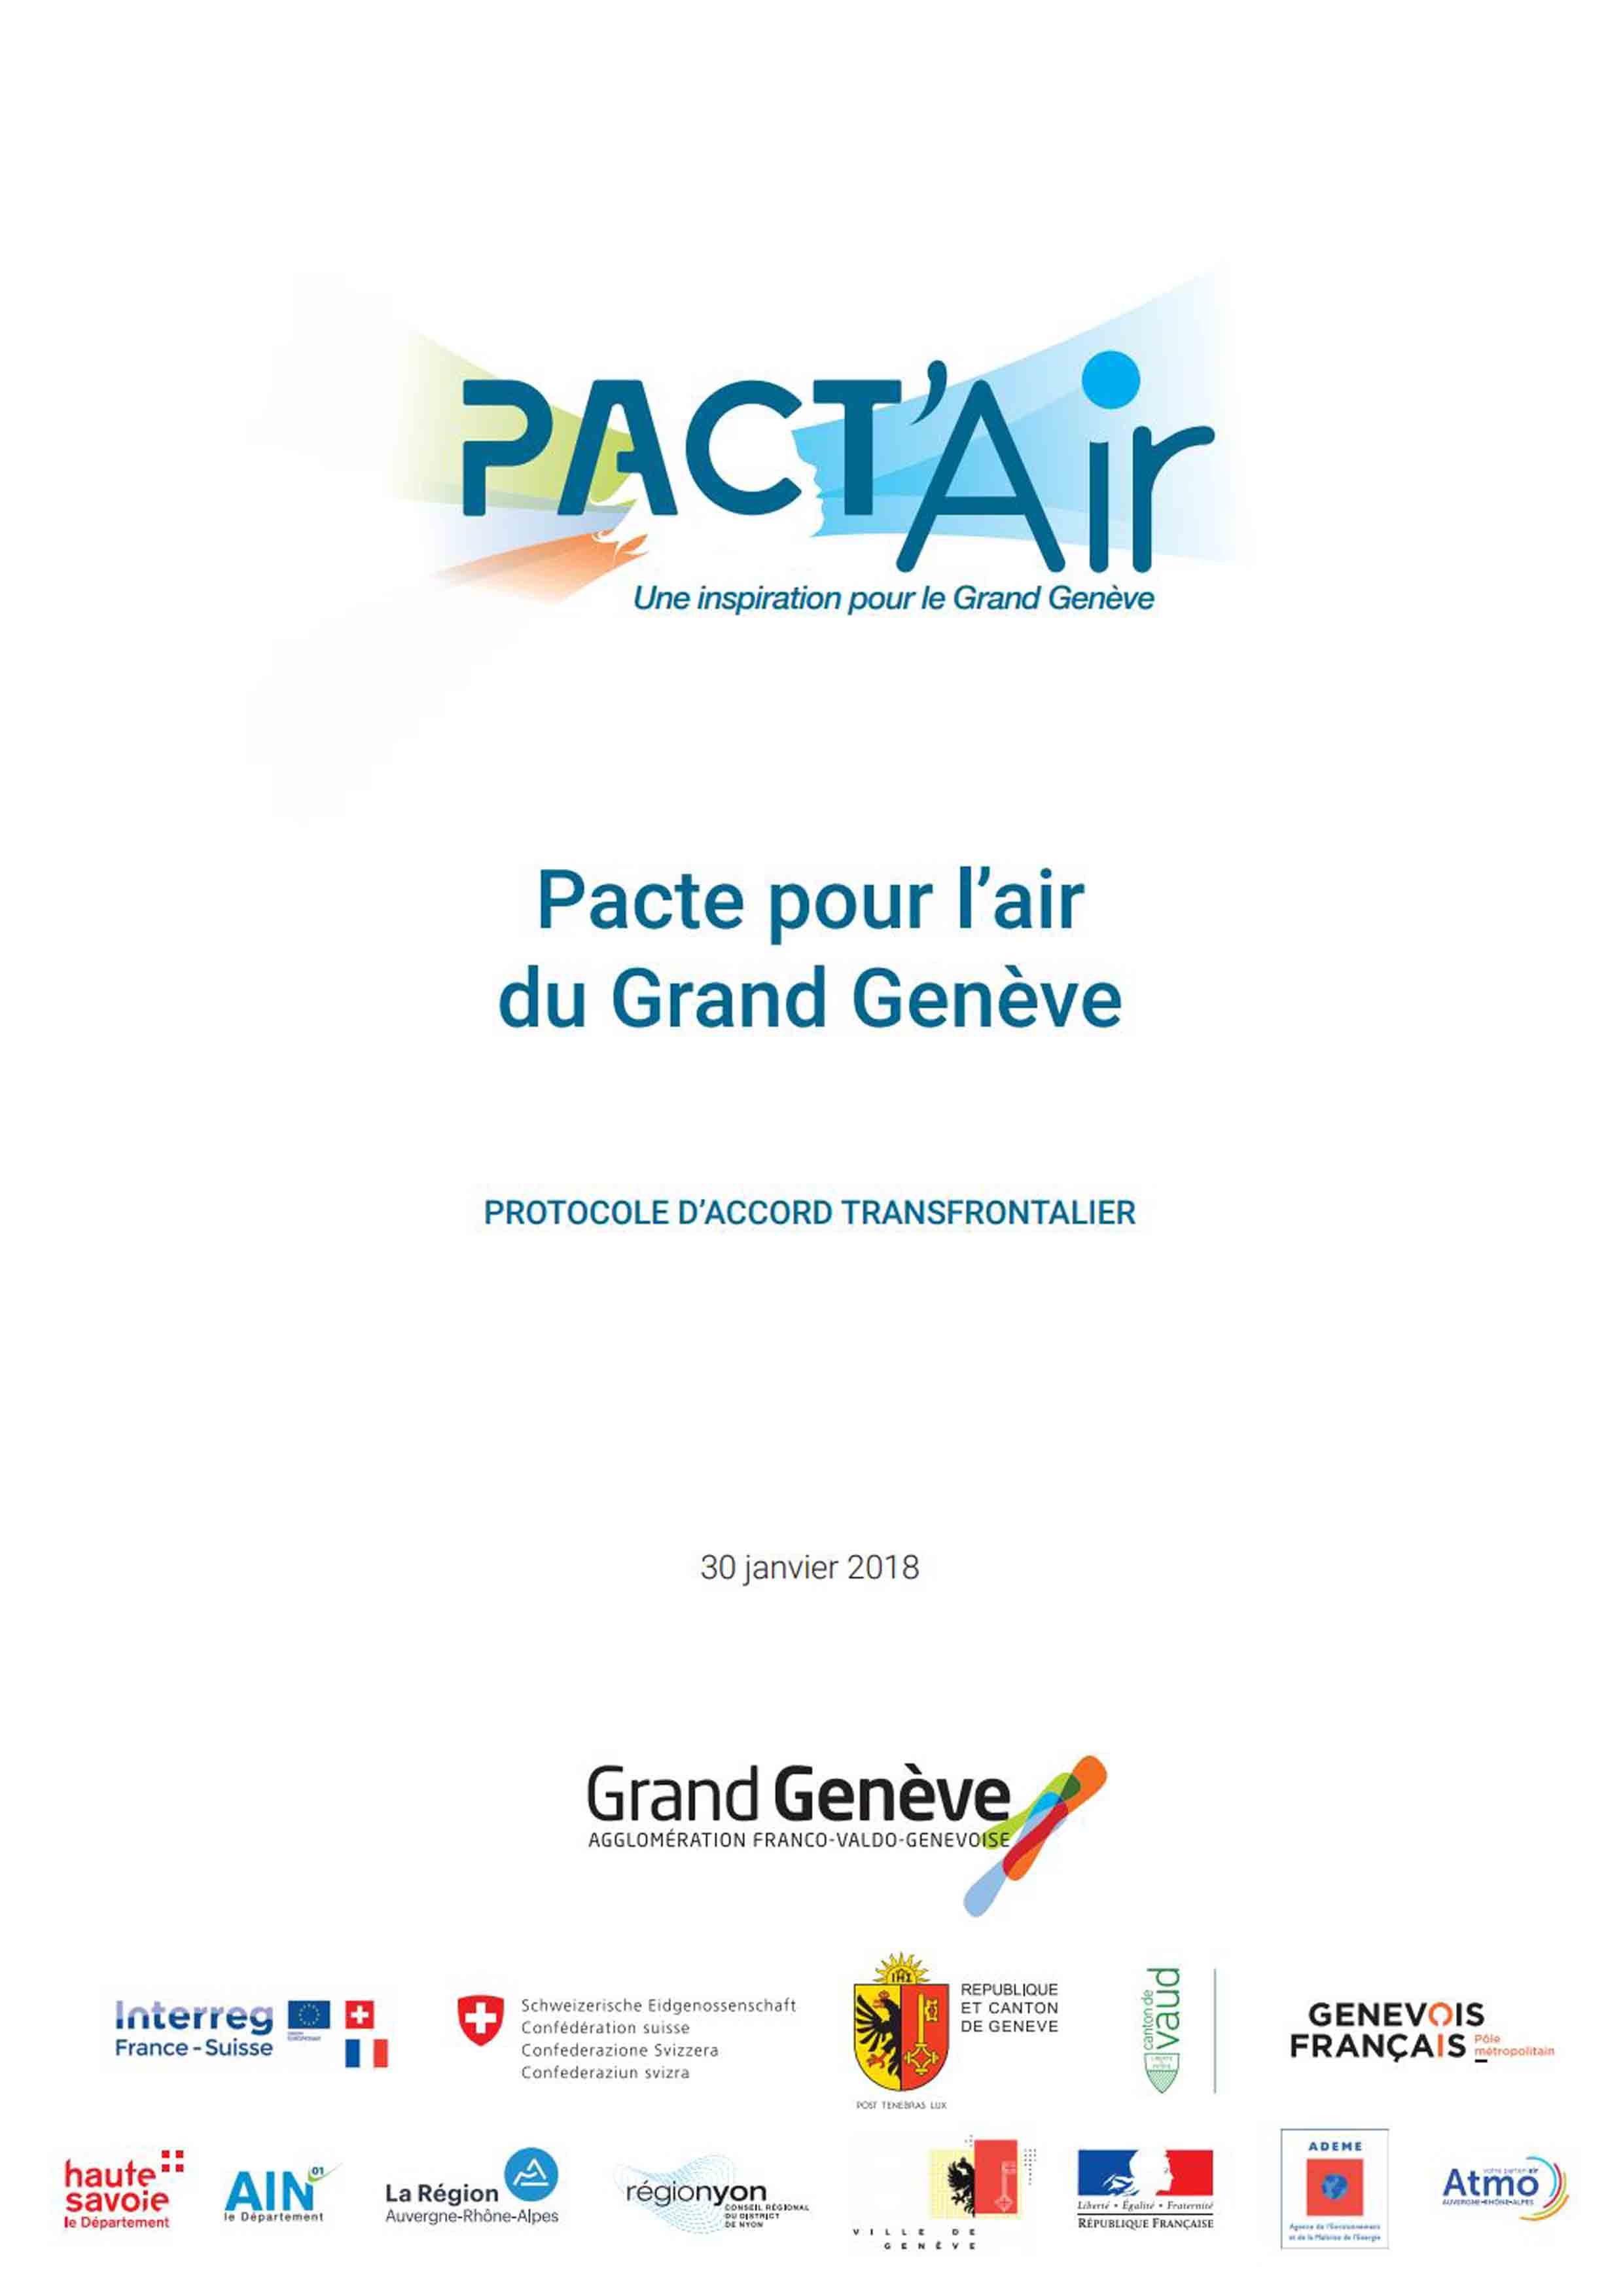 Protocole d'accord transfrontalier Grand Genève